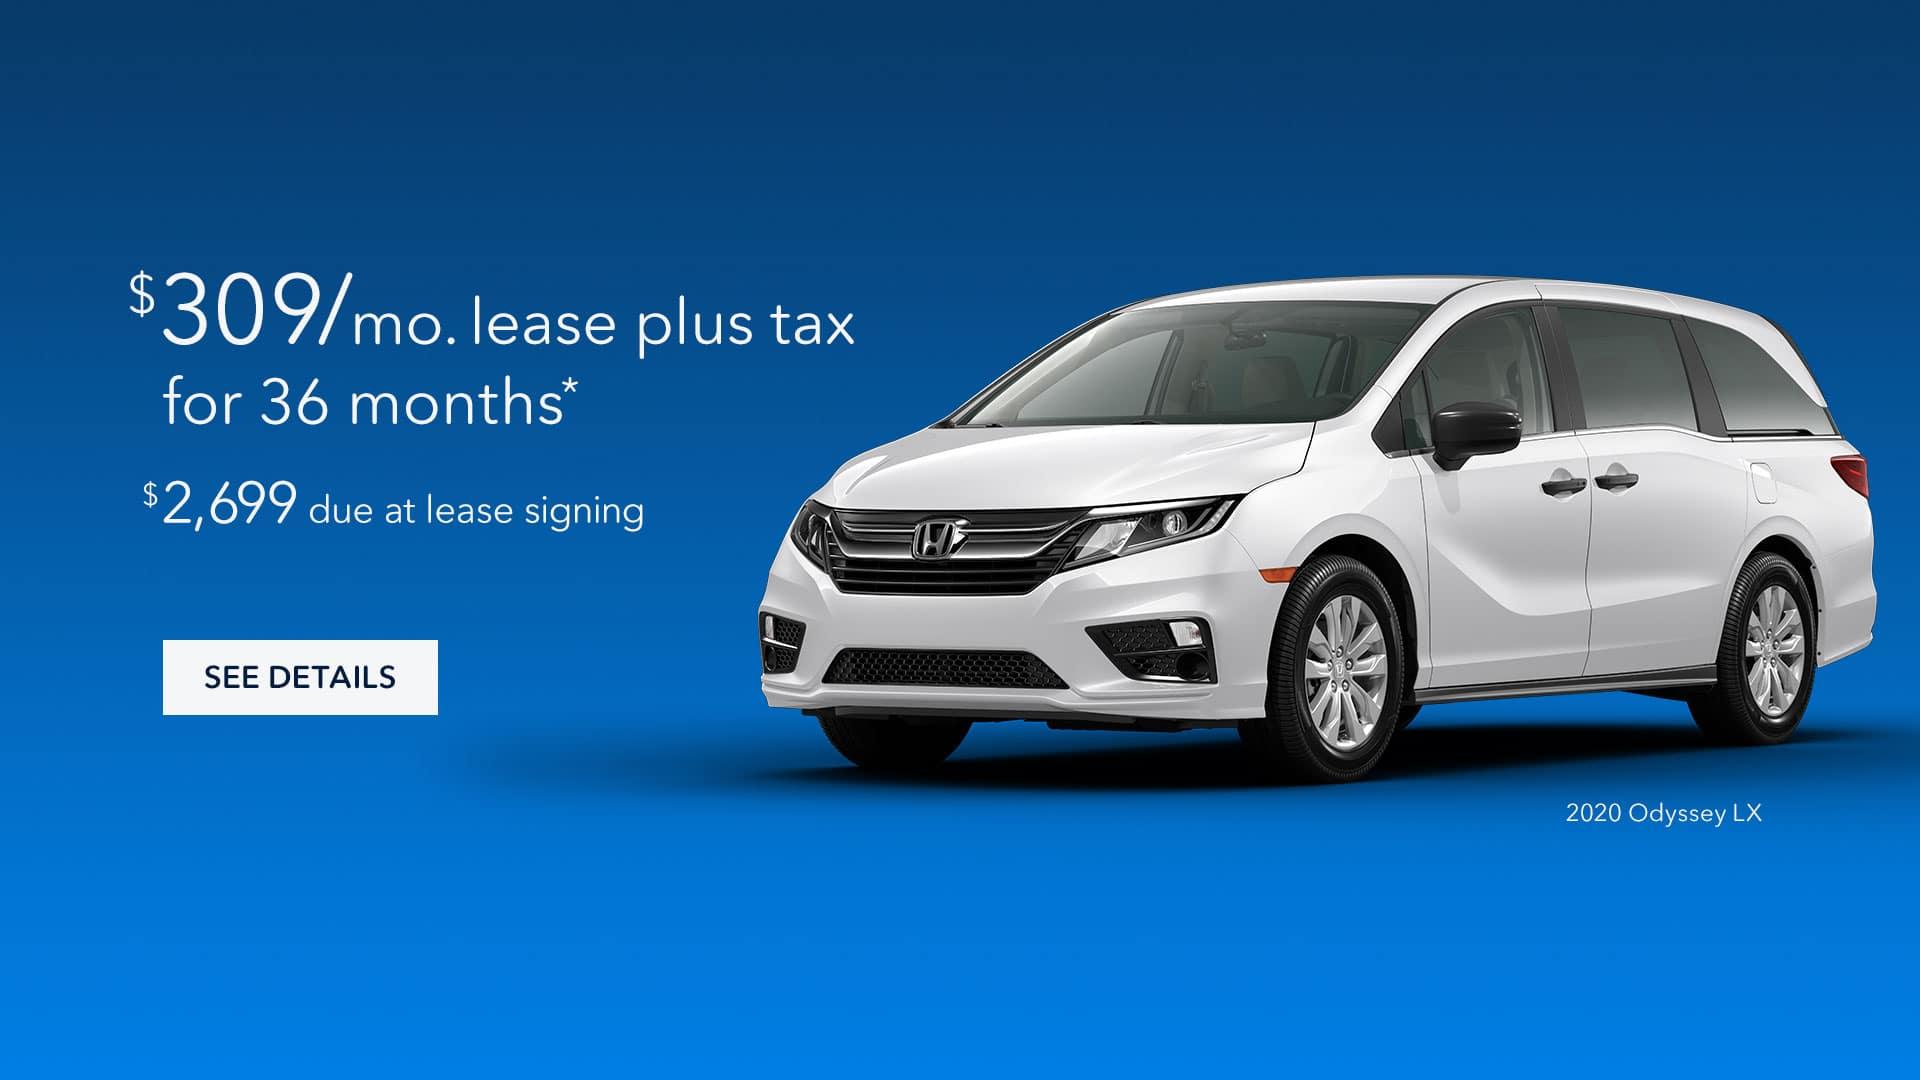 2020 Honda Odyssey Lease for $309